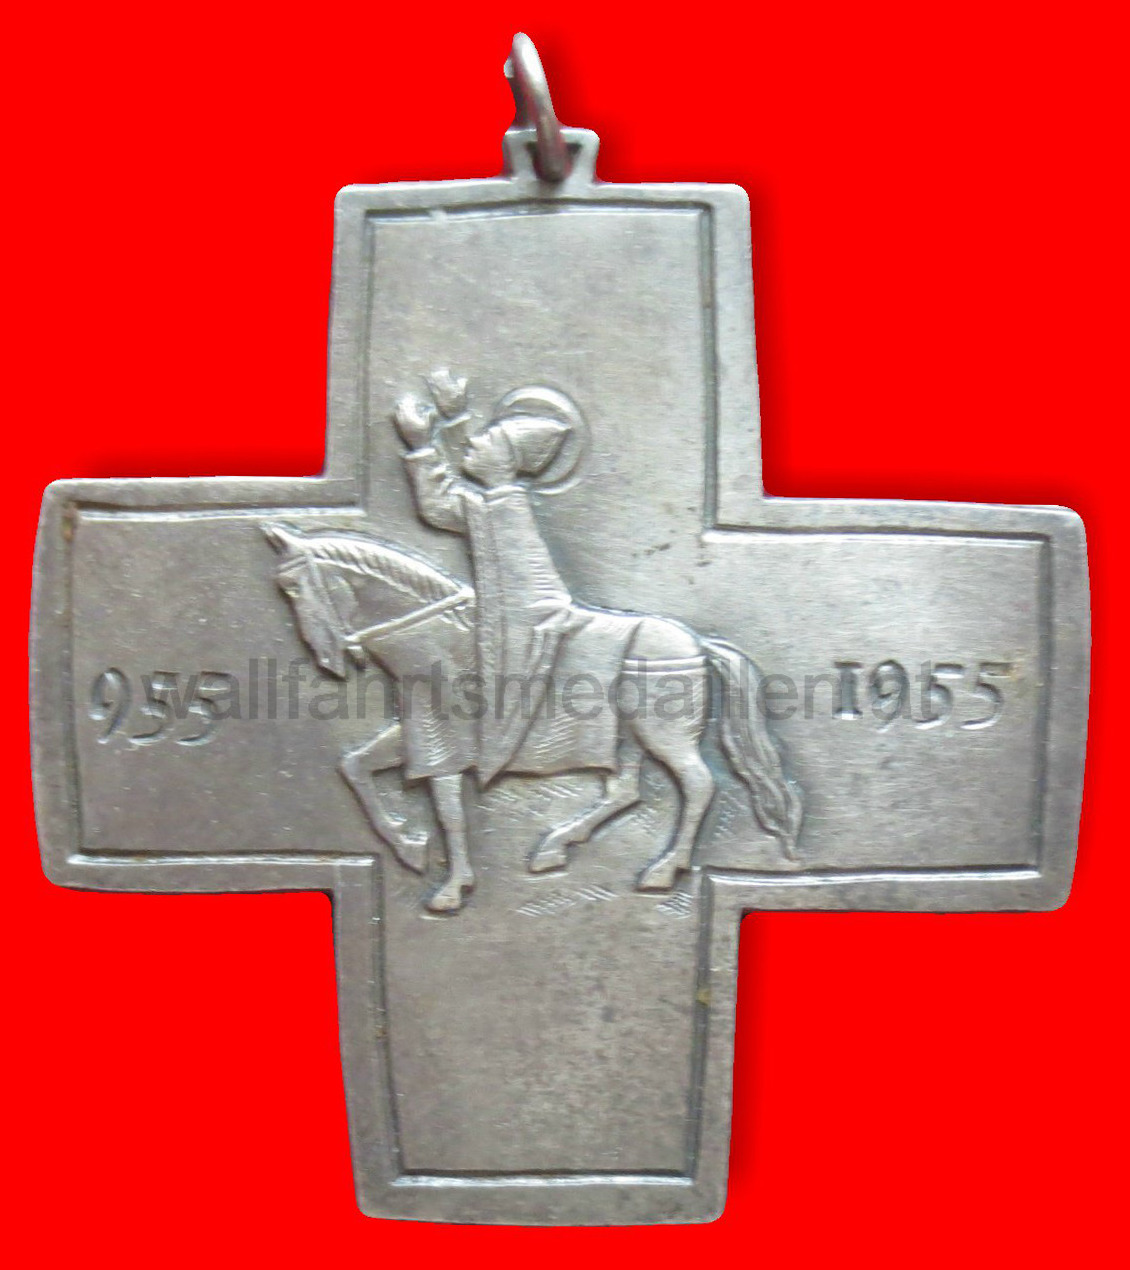 Ulrichkreuz